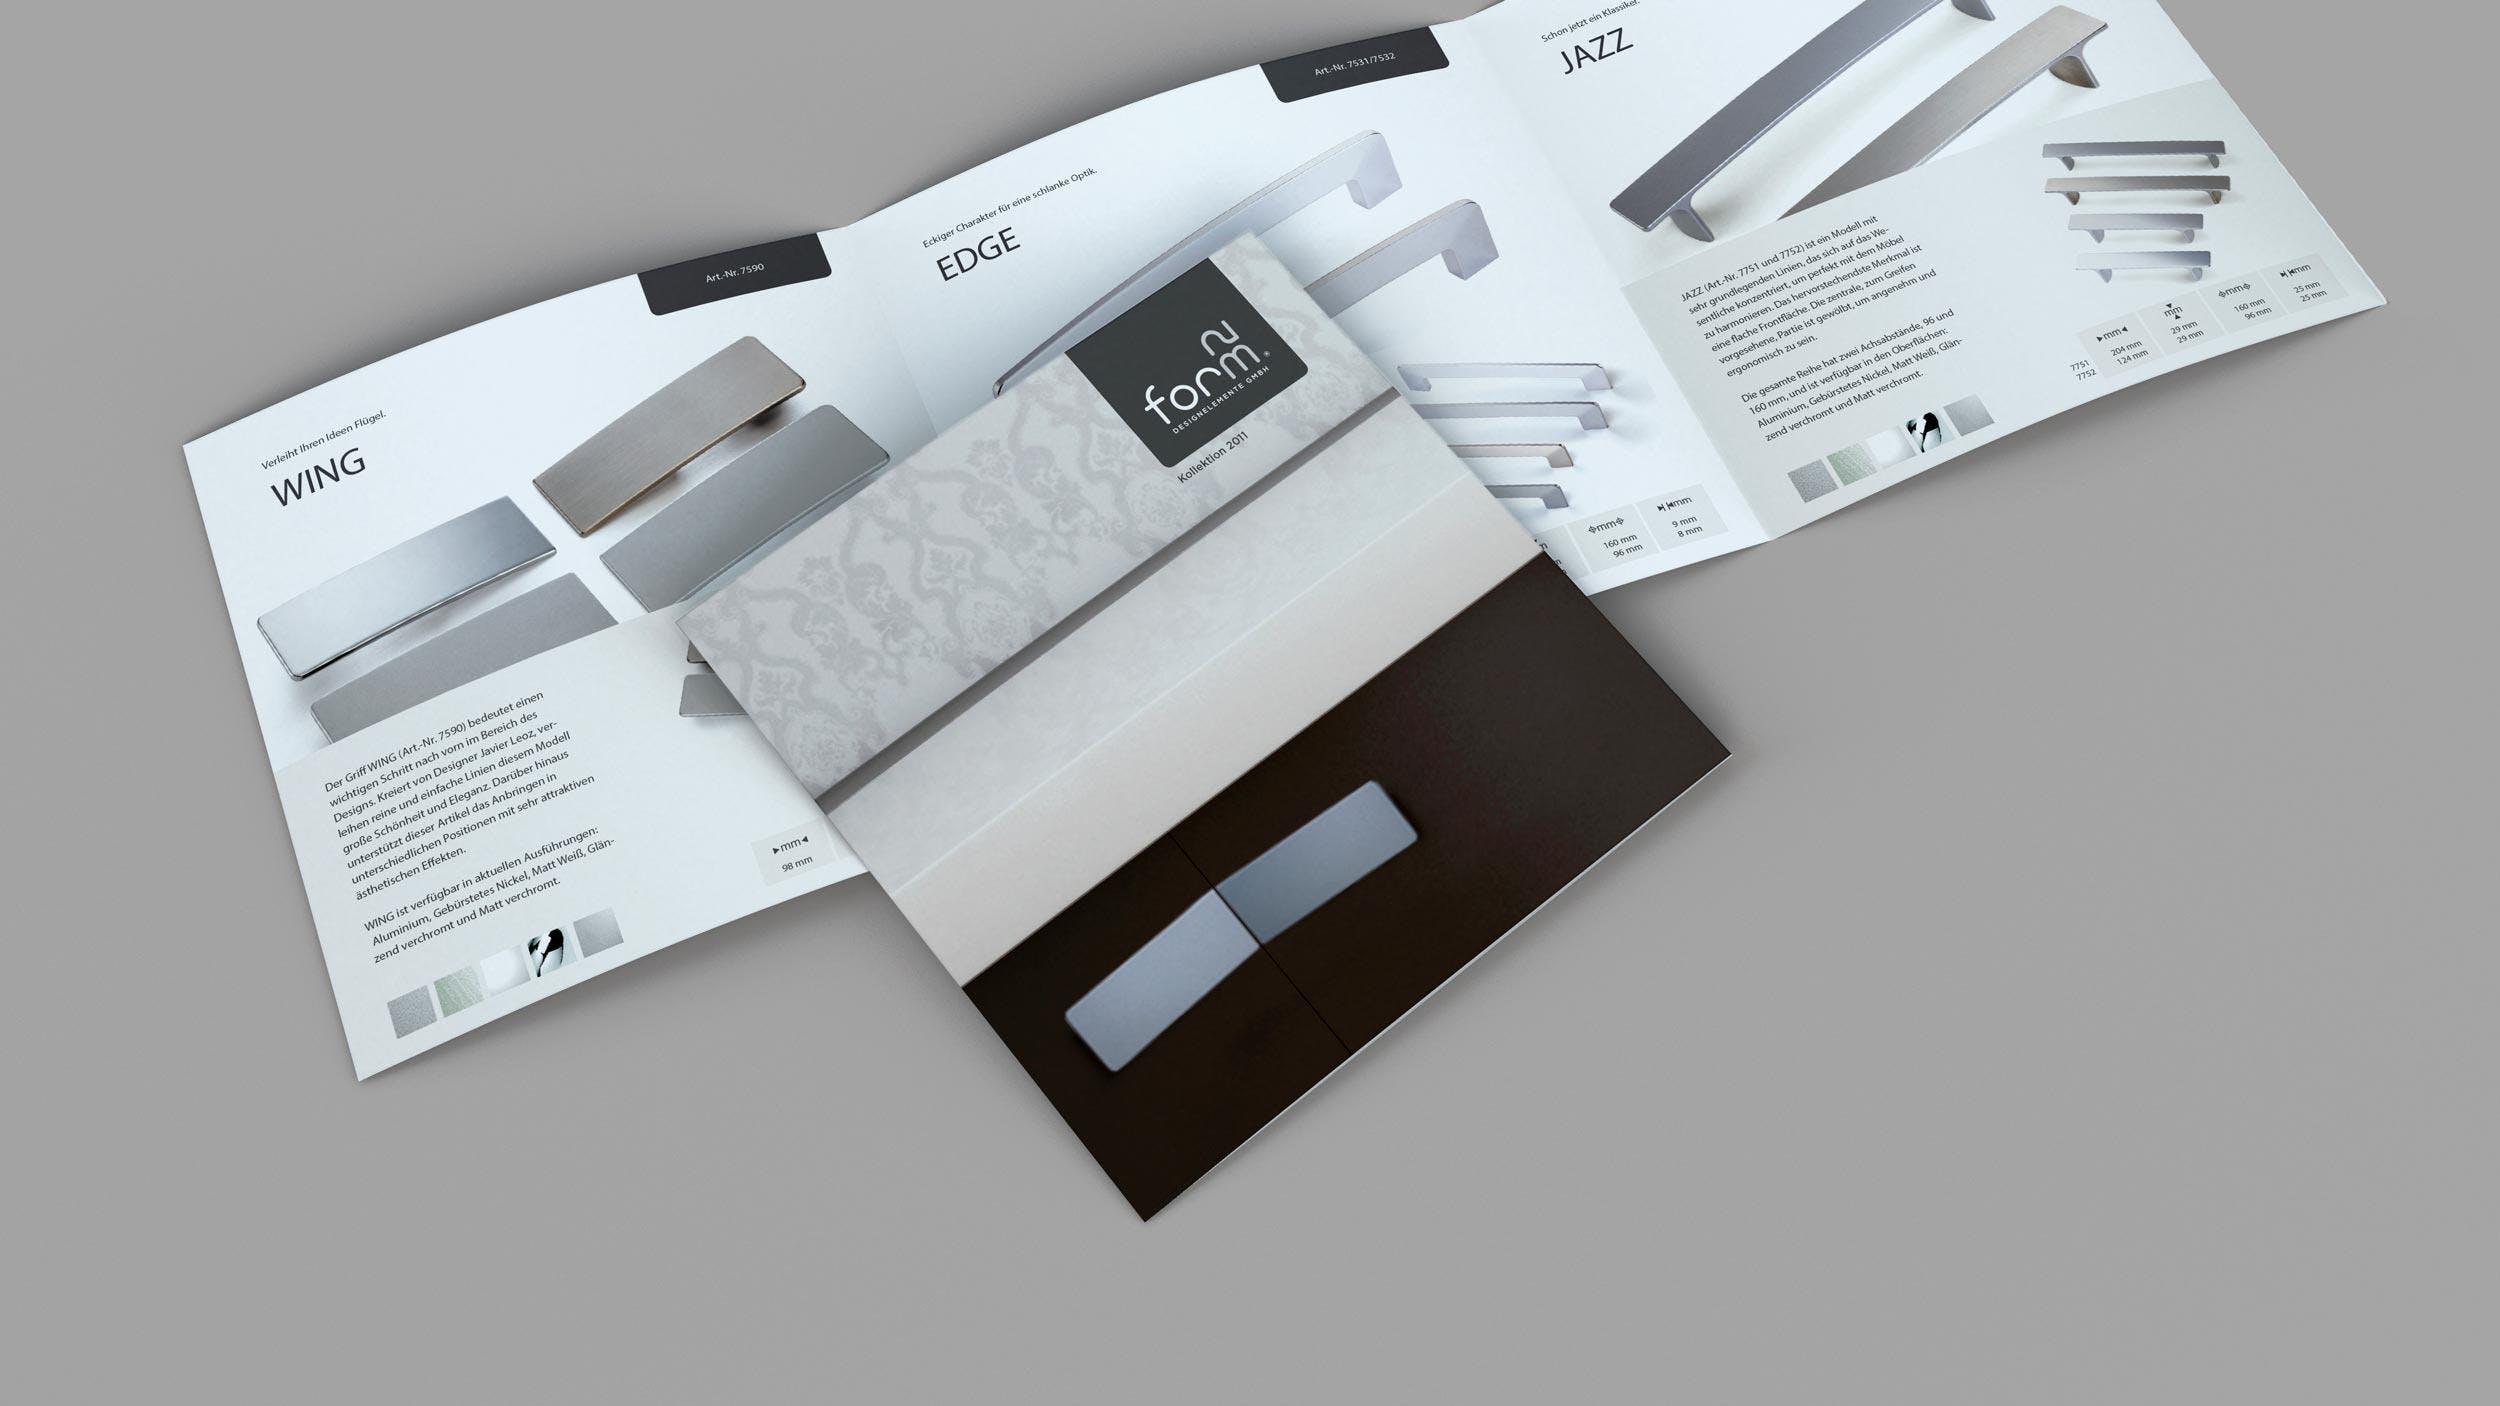 Form32 folder